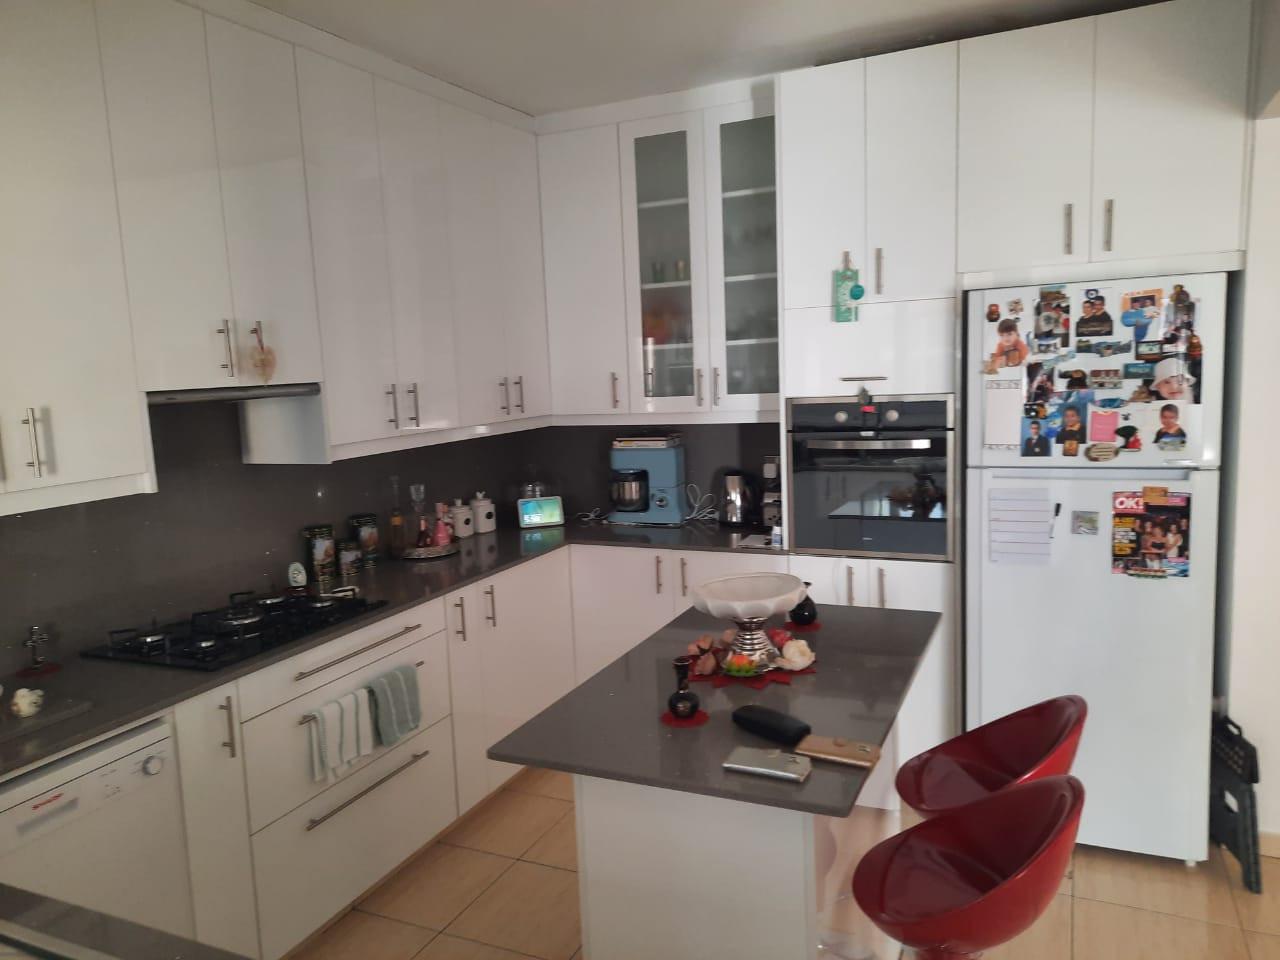 FC-33497: Apartment (Flat) in Mackenzie, Larnaca for Sale - #6